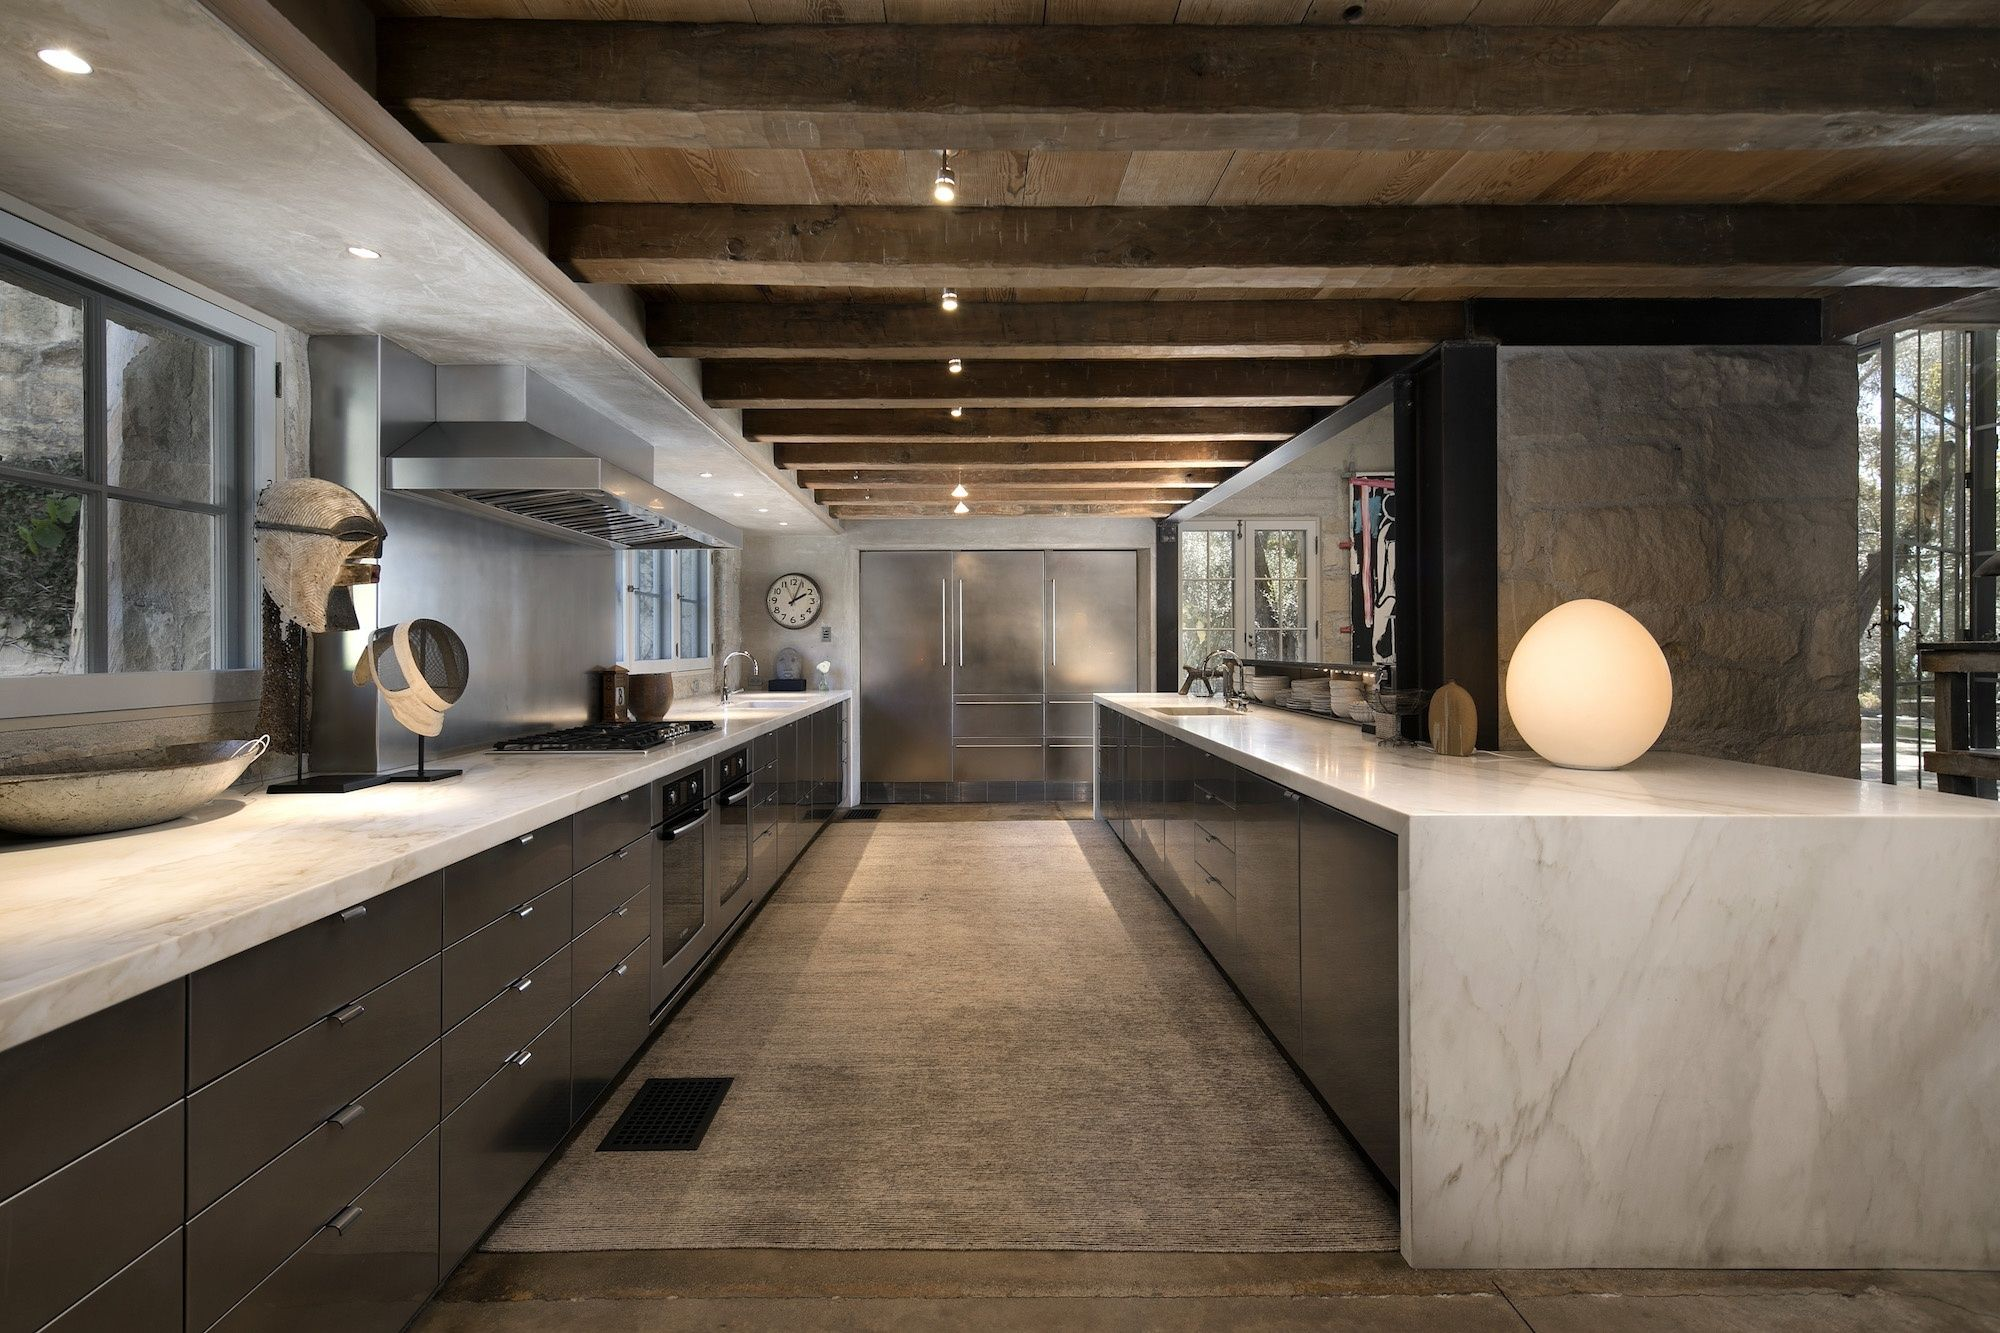 Une maison d 39 inspiration italienne santa barbara planete deco a homes world deco - Deco italienne maison ...